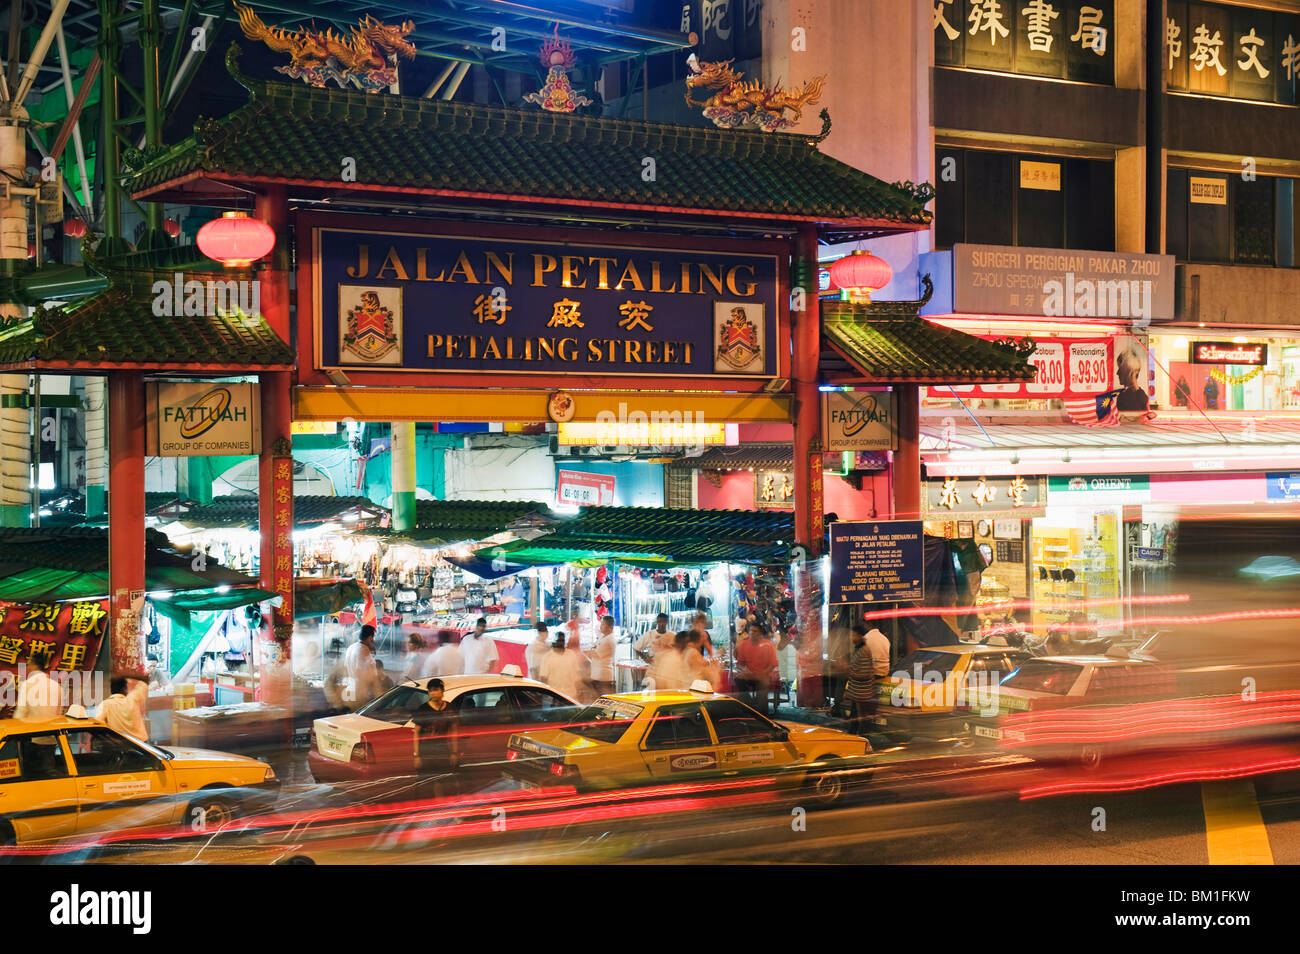 Embarquement au chinois marché Petaling Street, Chinatown, Kuala Lumpur, Malaisie, Asie du Sud, Asie Photo Stock